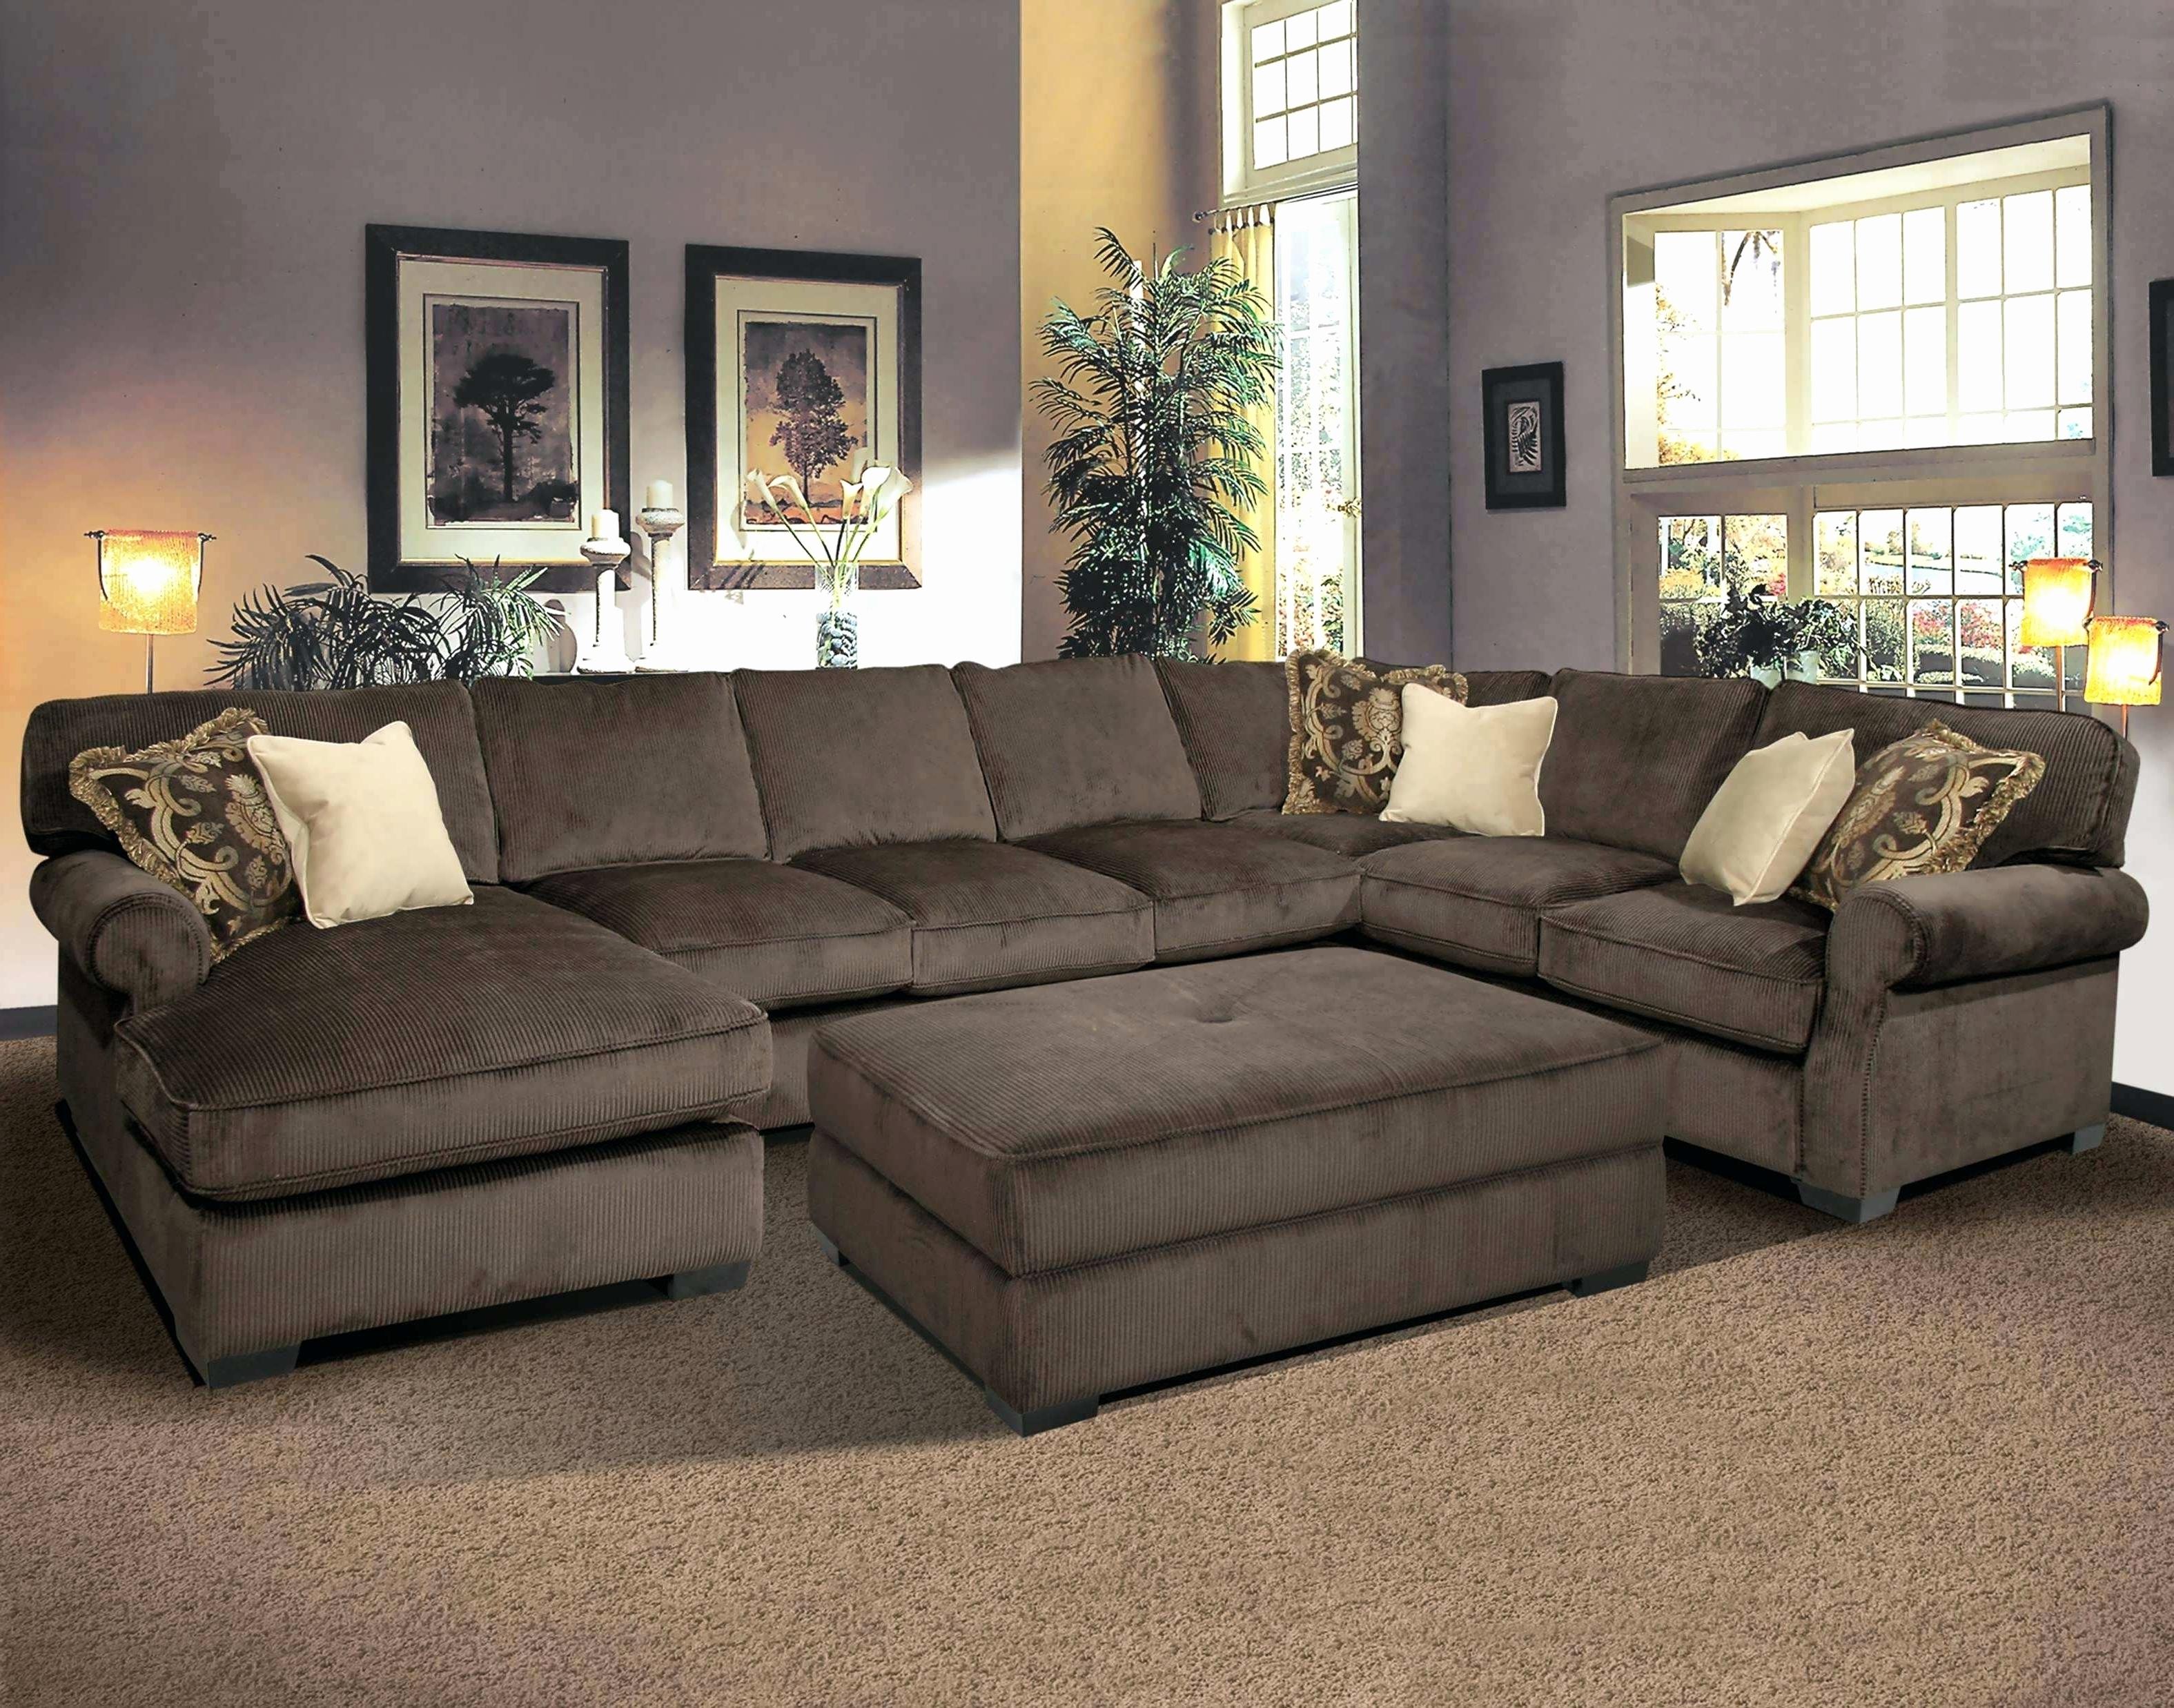 Most Popular Gta Sectional Sofas Regarding Genuine Leather Sofa Sets Kijiji Gta (View 10 of 15)